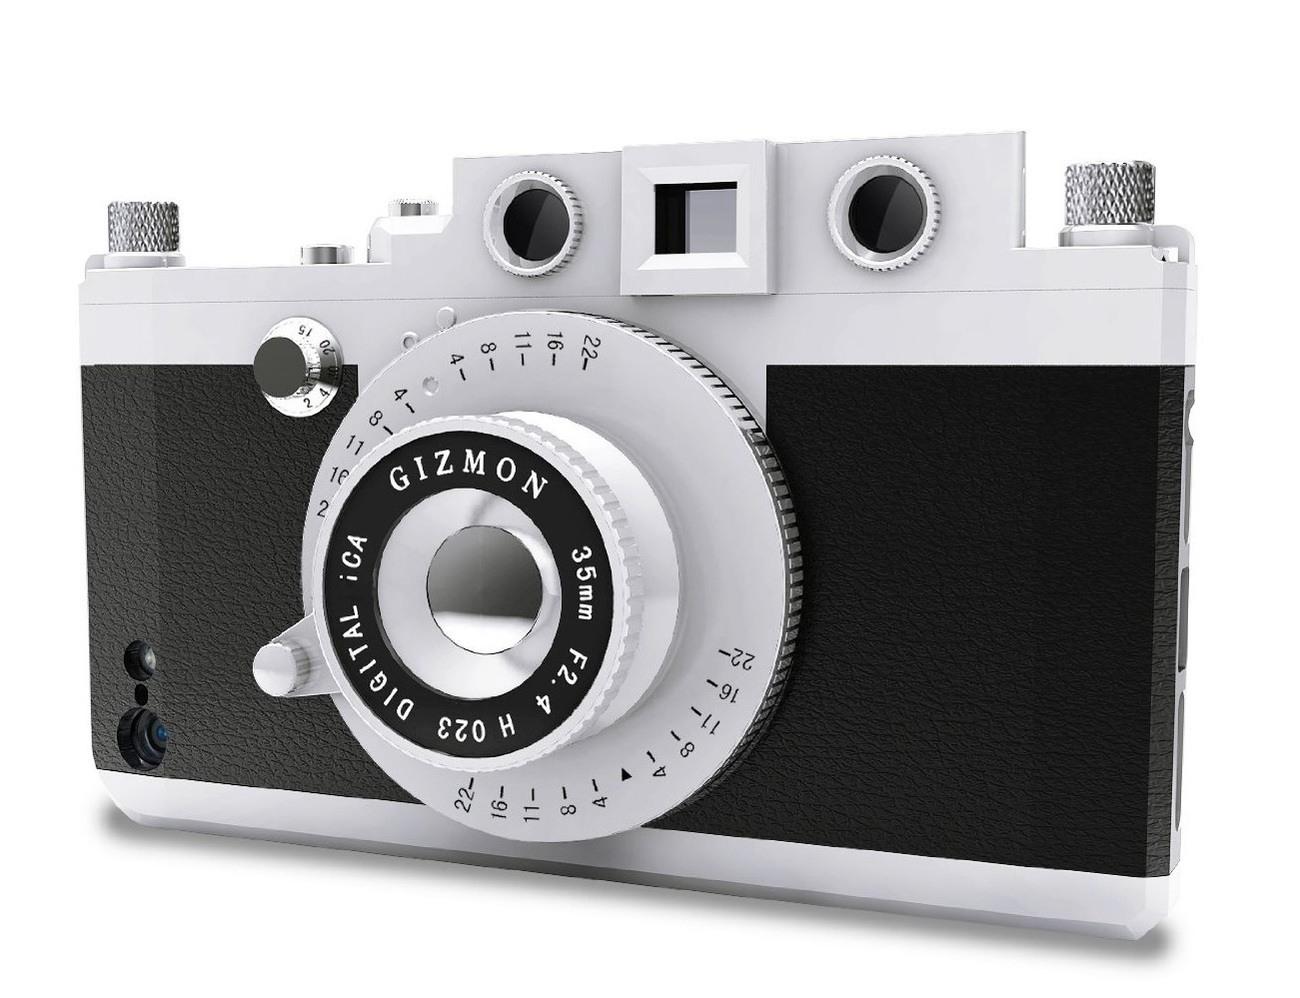 Gizmon Vintage Camera Case For iPhone SE/5s